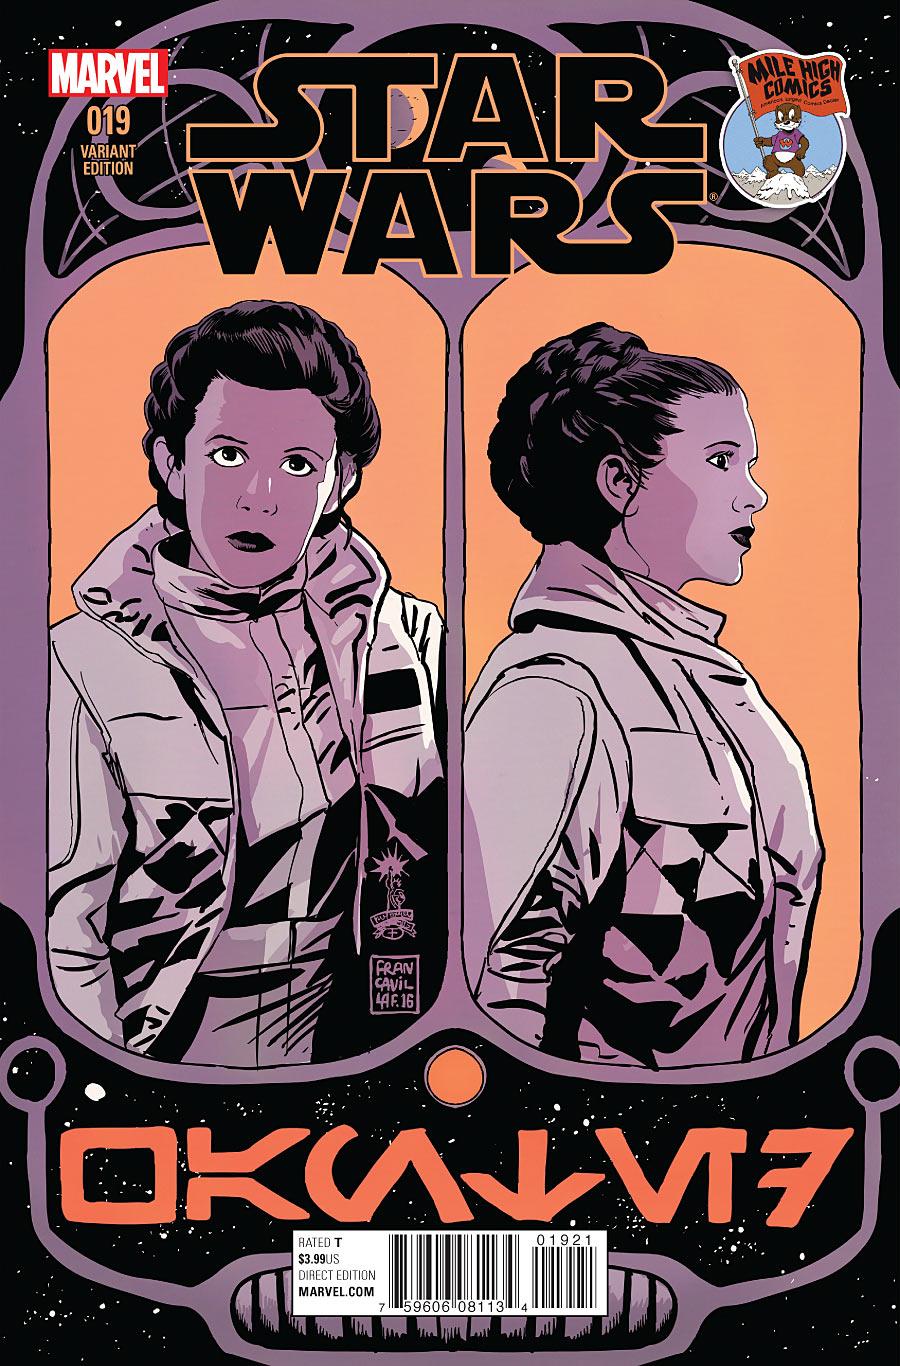 Star Wars Vol 2 19 Mile High Comics Variant.jpg